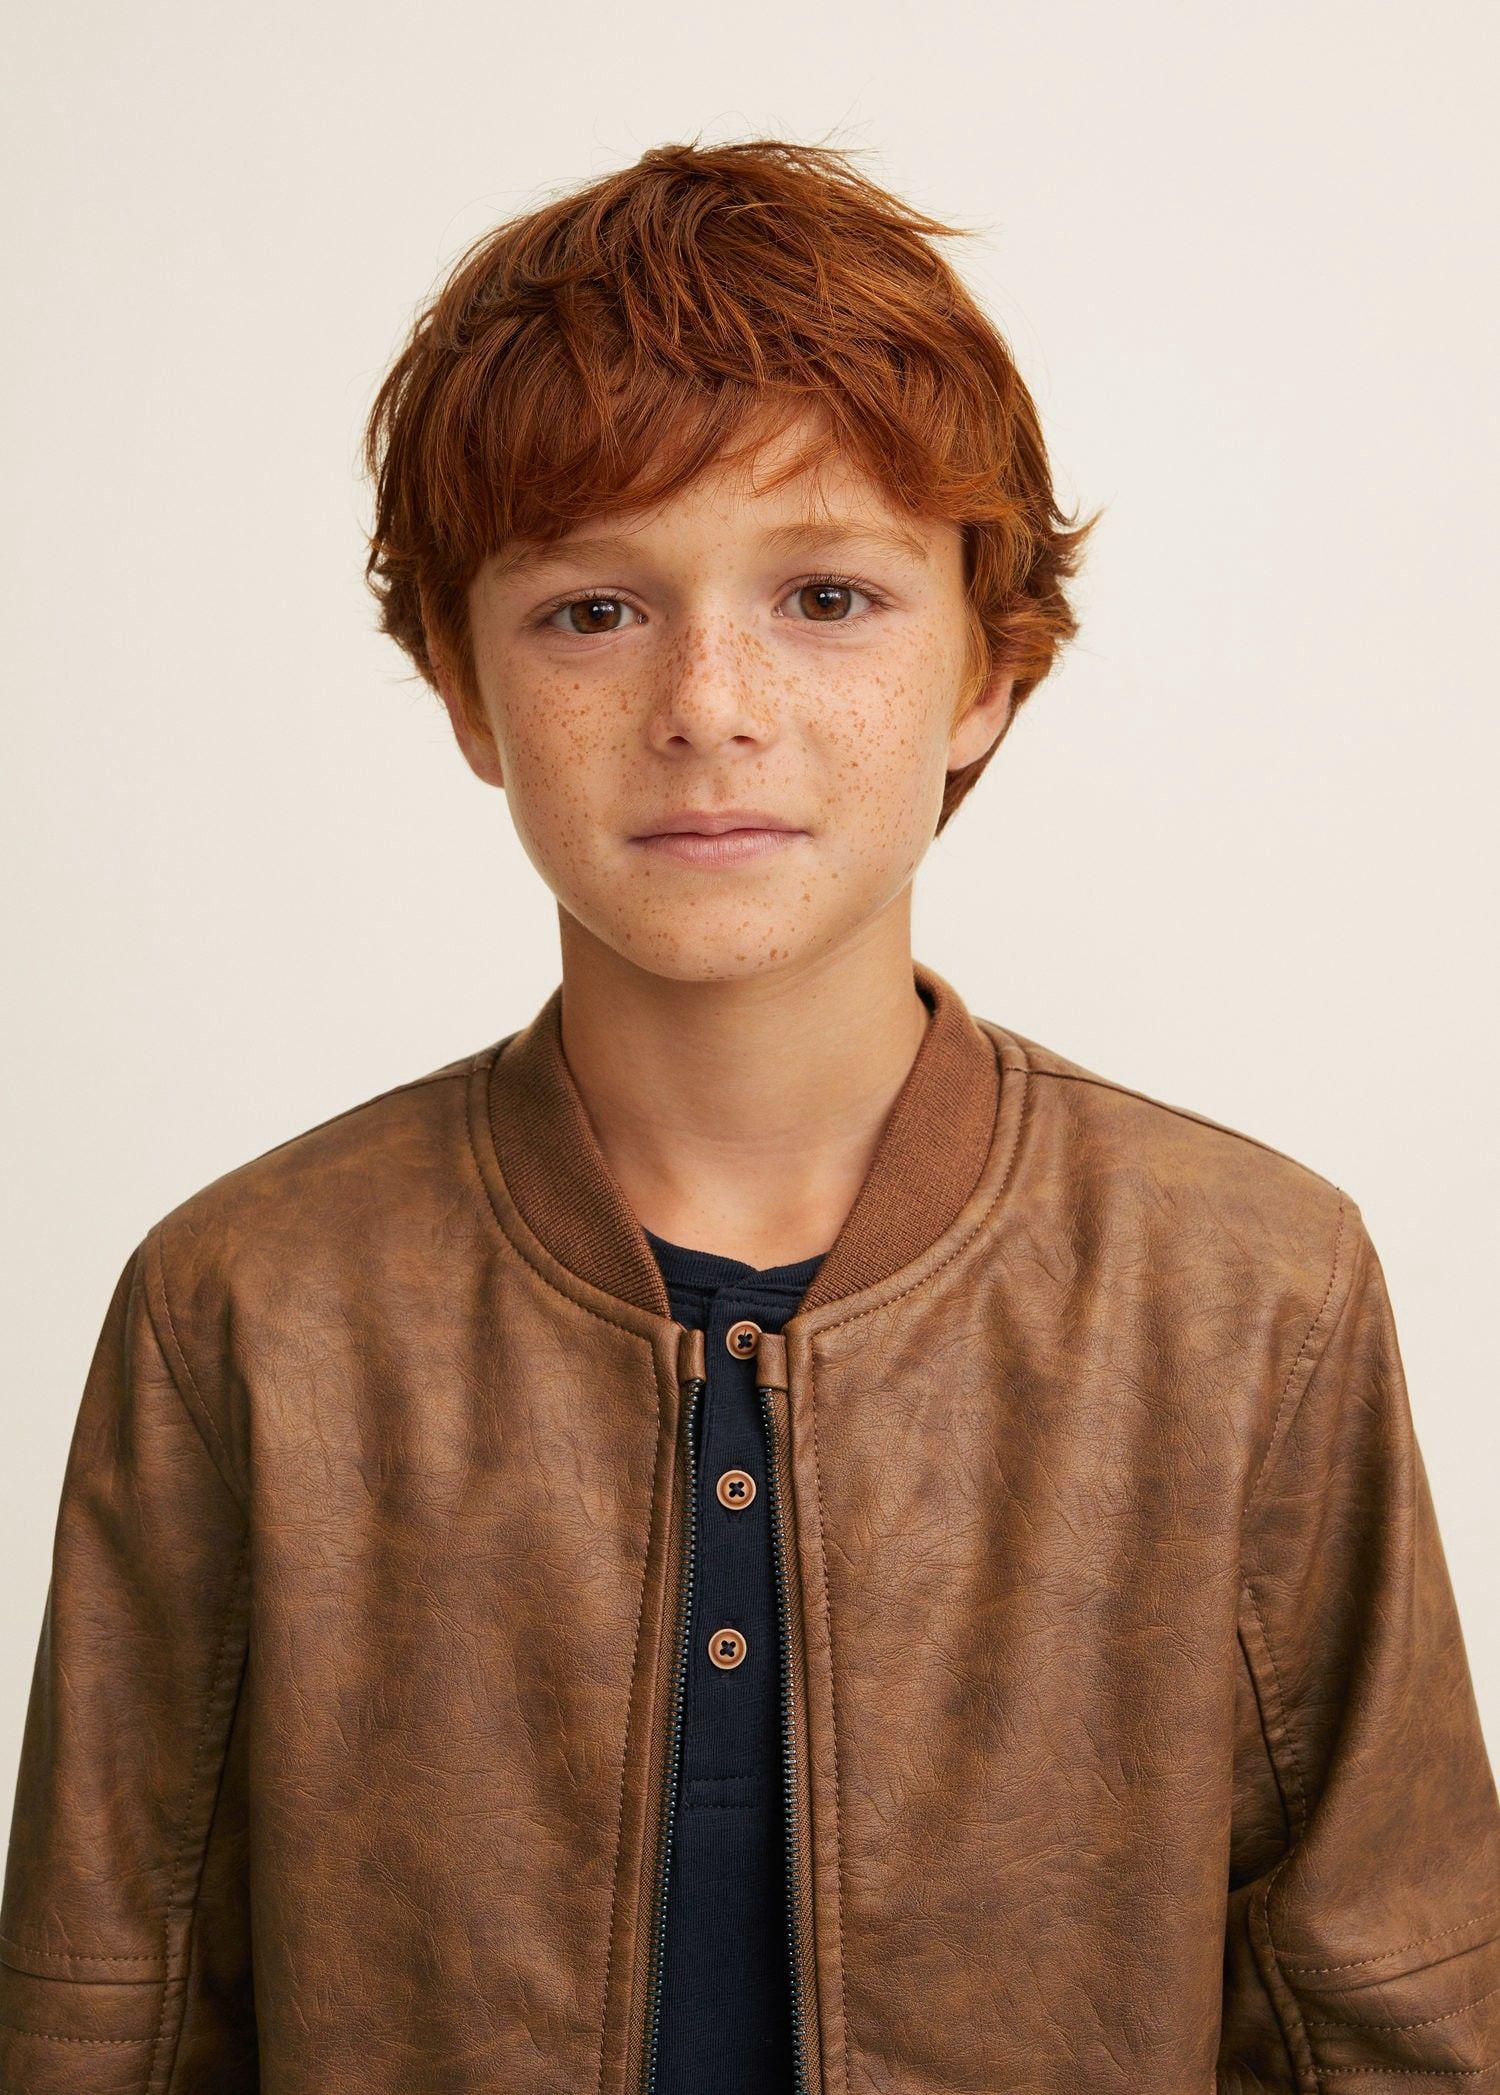 Mango Faux Shearling Bomber Jacket 6 7 Years 122cm Red Head Boy Beauty Of Boys Cute Boys